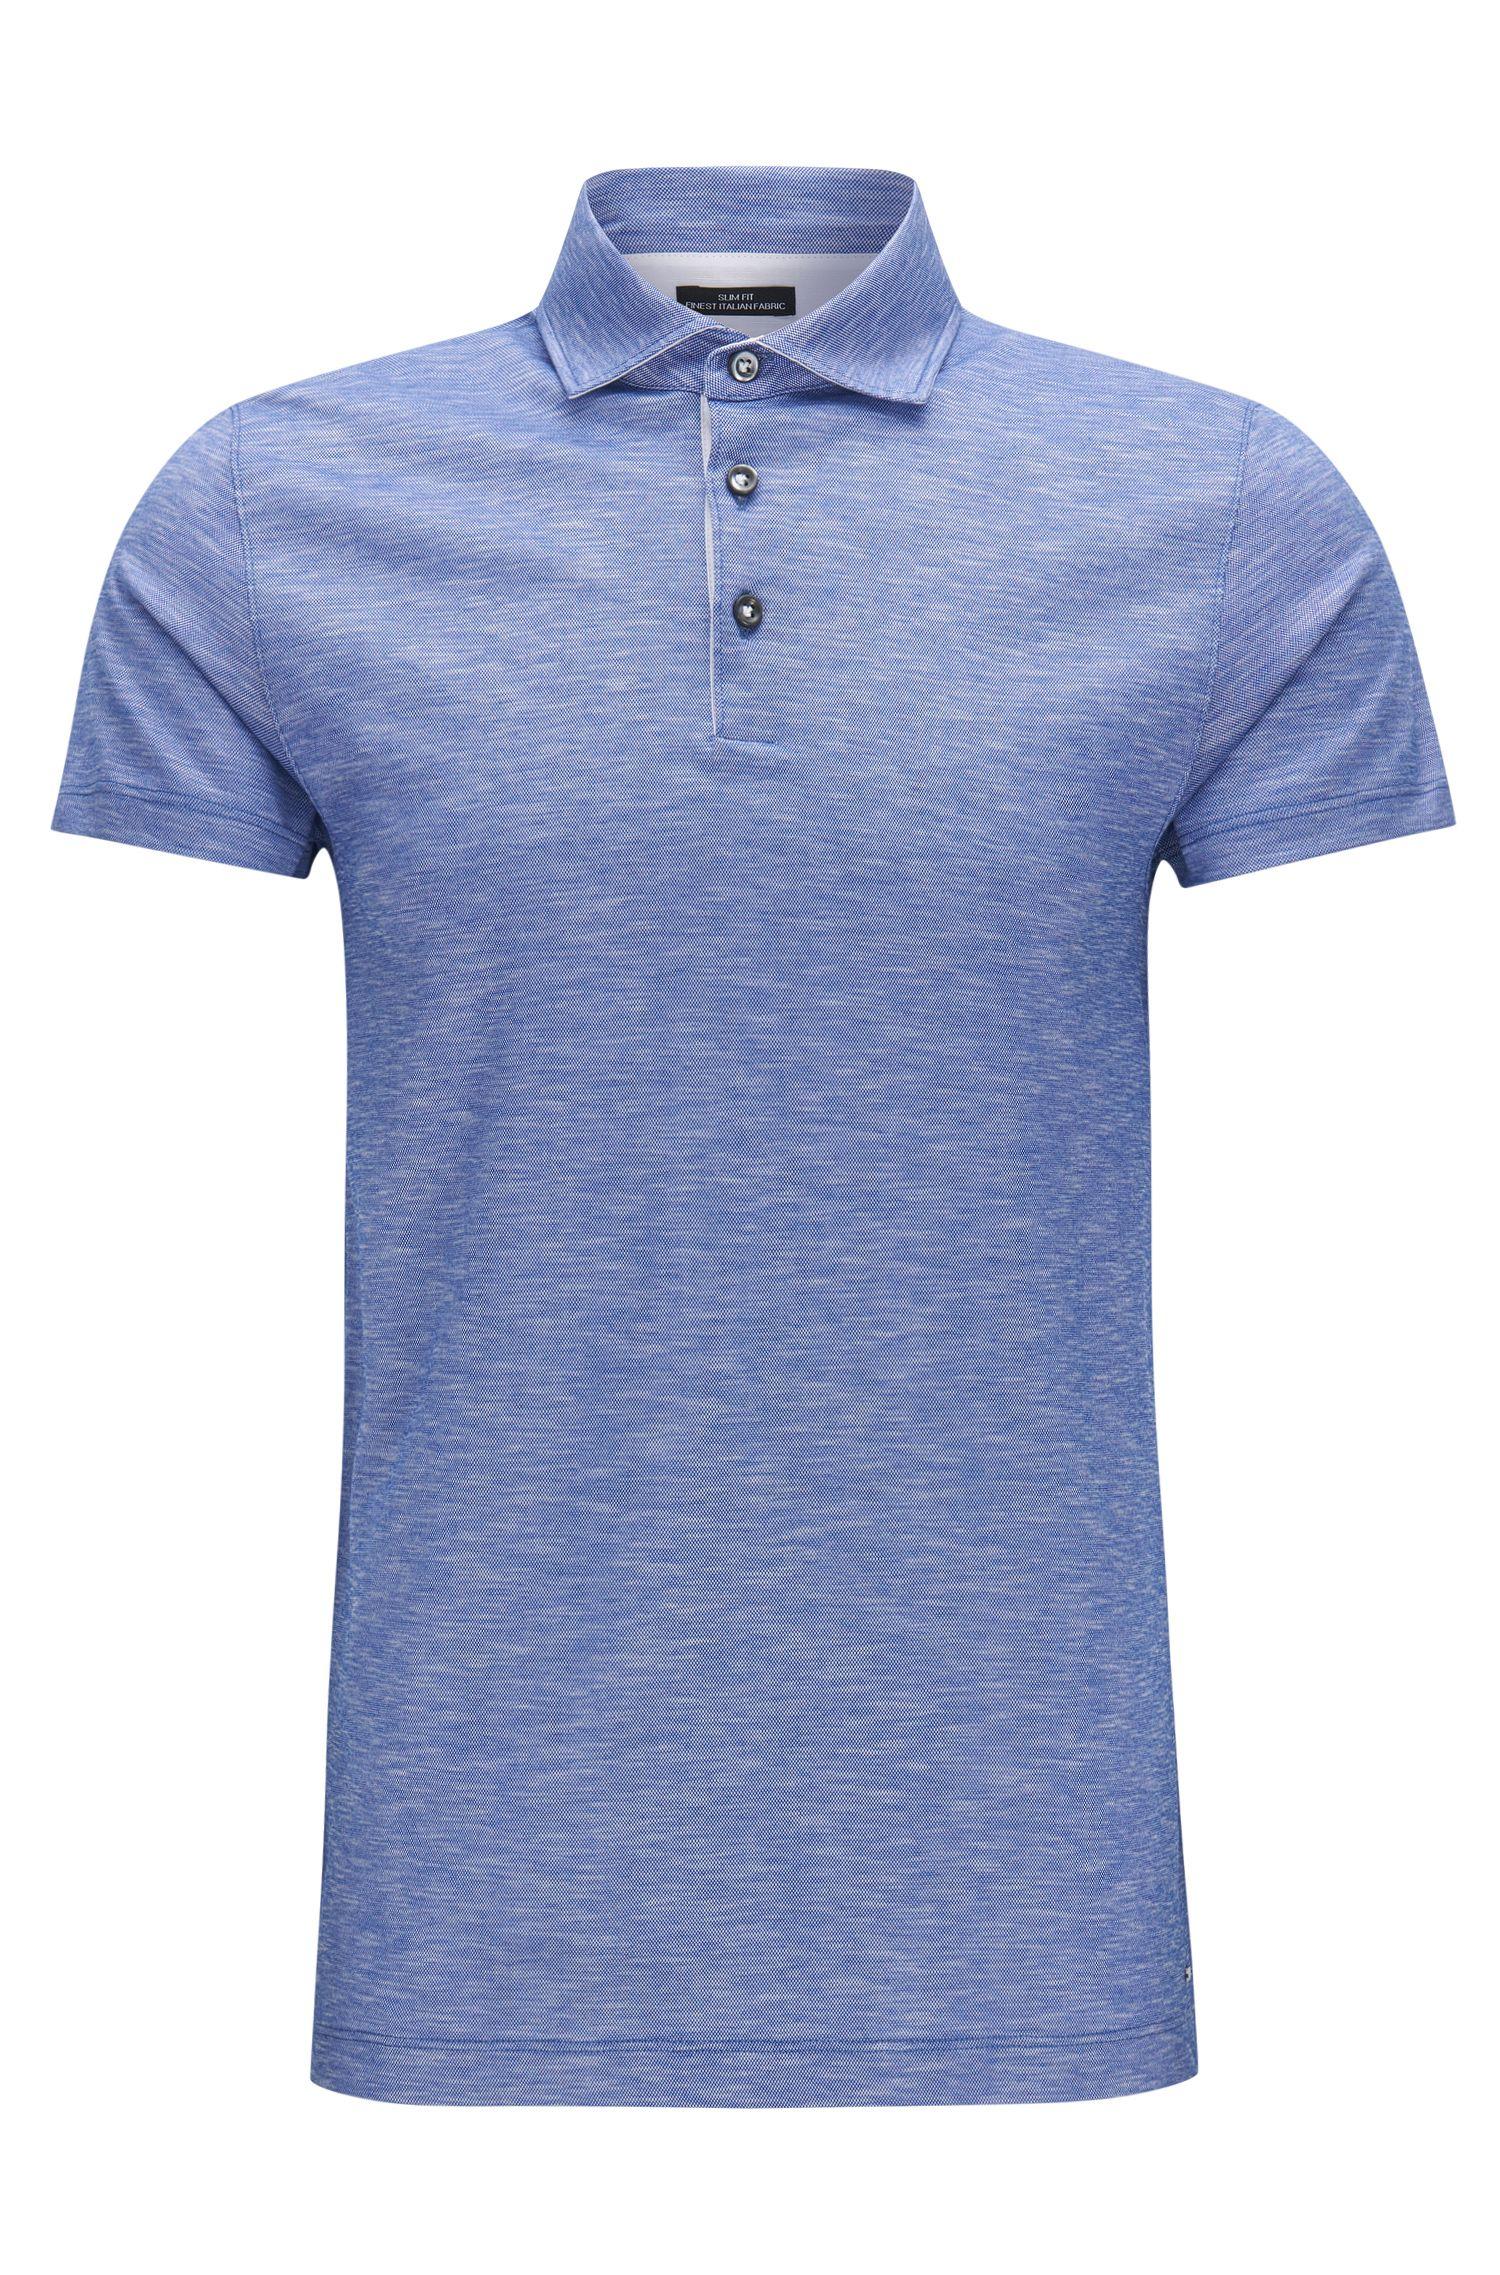 Slim-Fit Poloshirt aus Baumwoll-Jacquard in Leinen-Optik